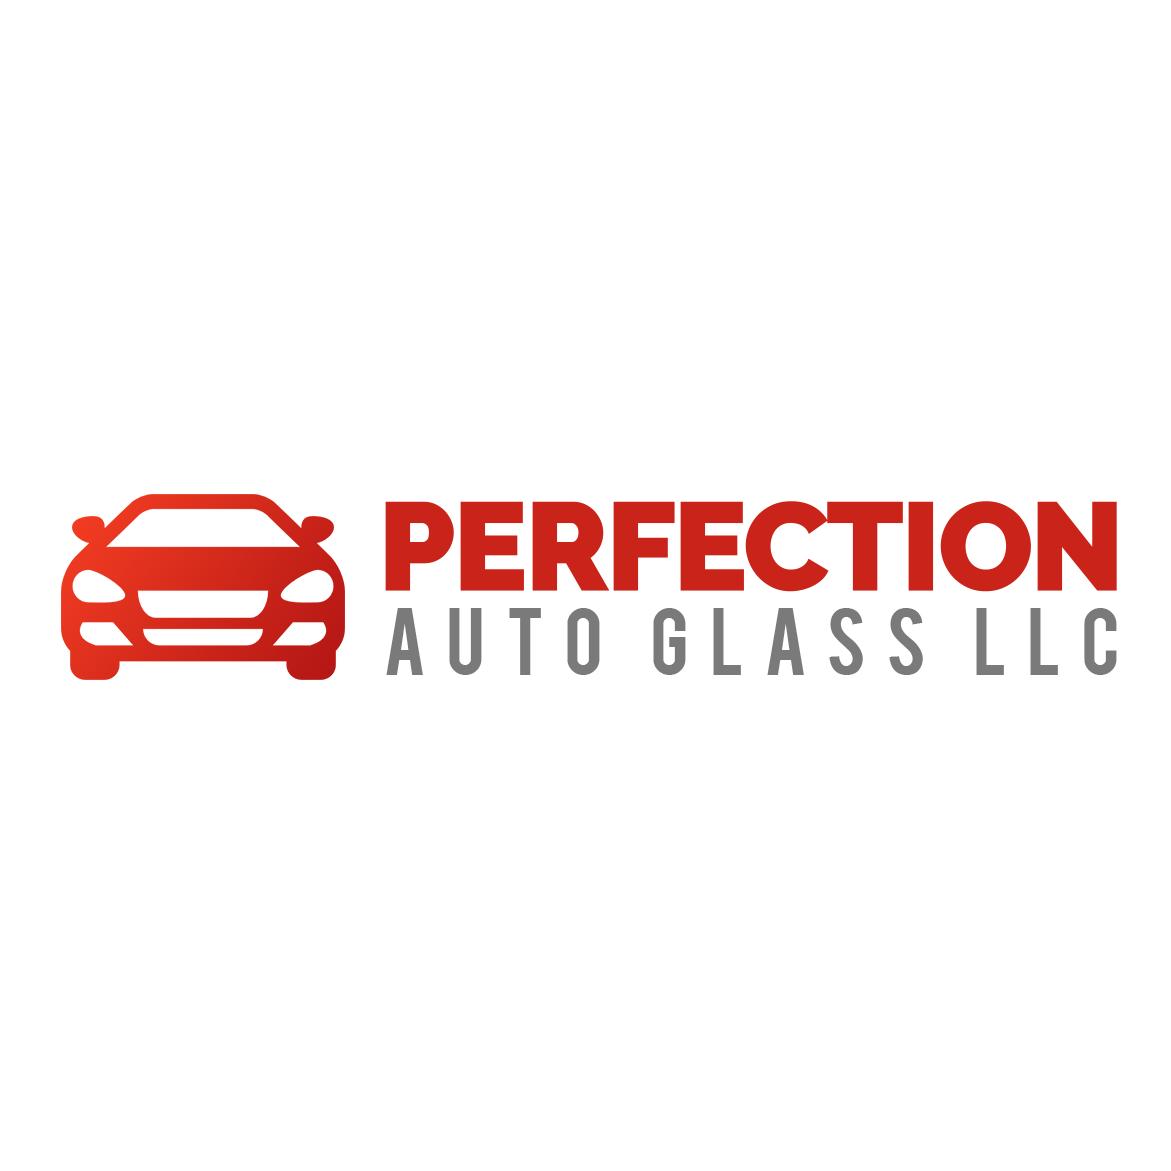 Perfection Auto Glass, LLC Logo